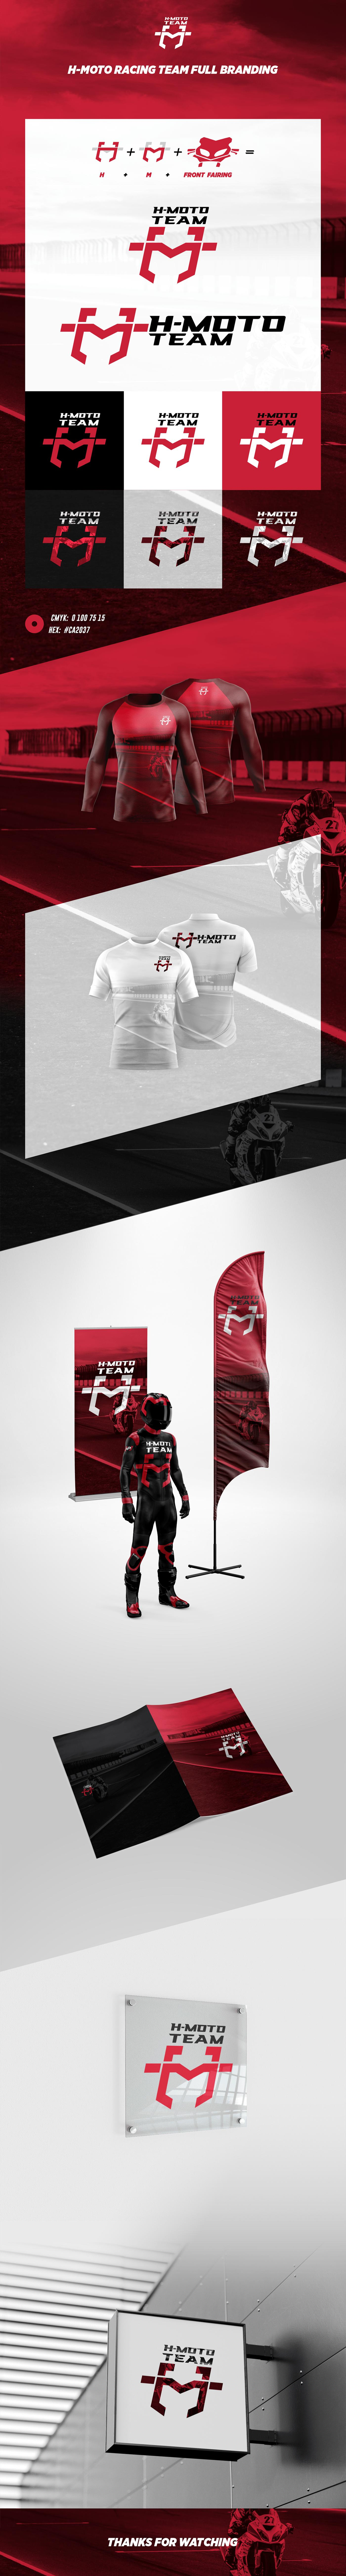 logo branding  Racing identity Motorsport motorcycle team sport